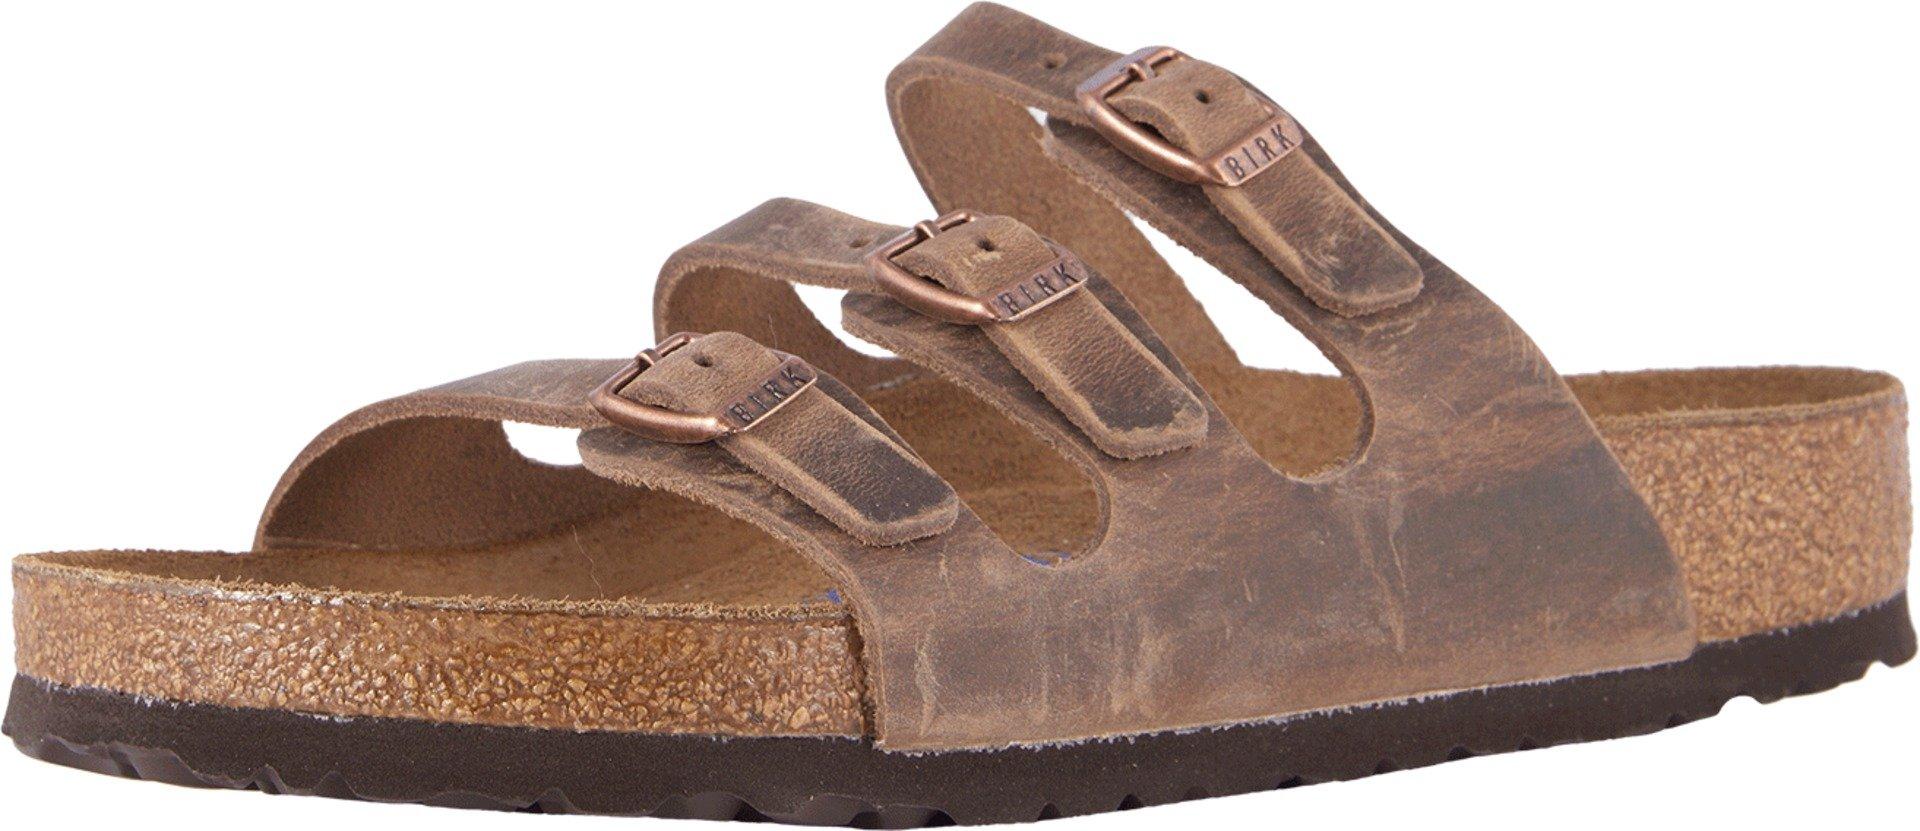 Birkenstock Women's Florida Soft Footbed Sandal Tobacco Oiled Leather 39 R by Birkenstock